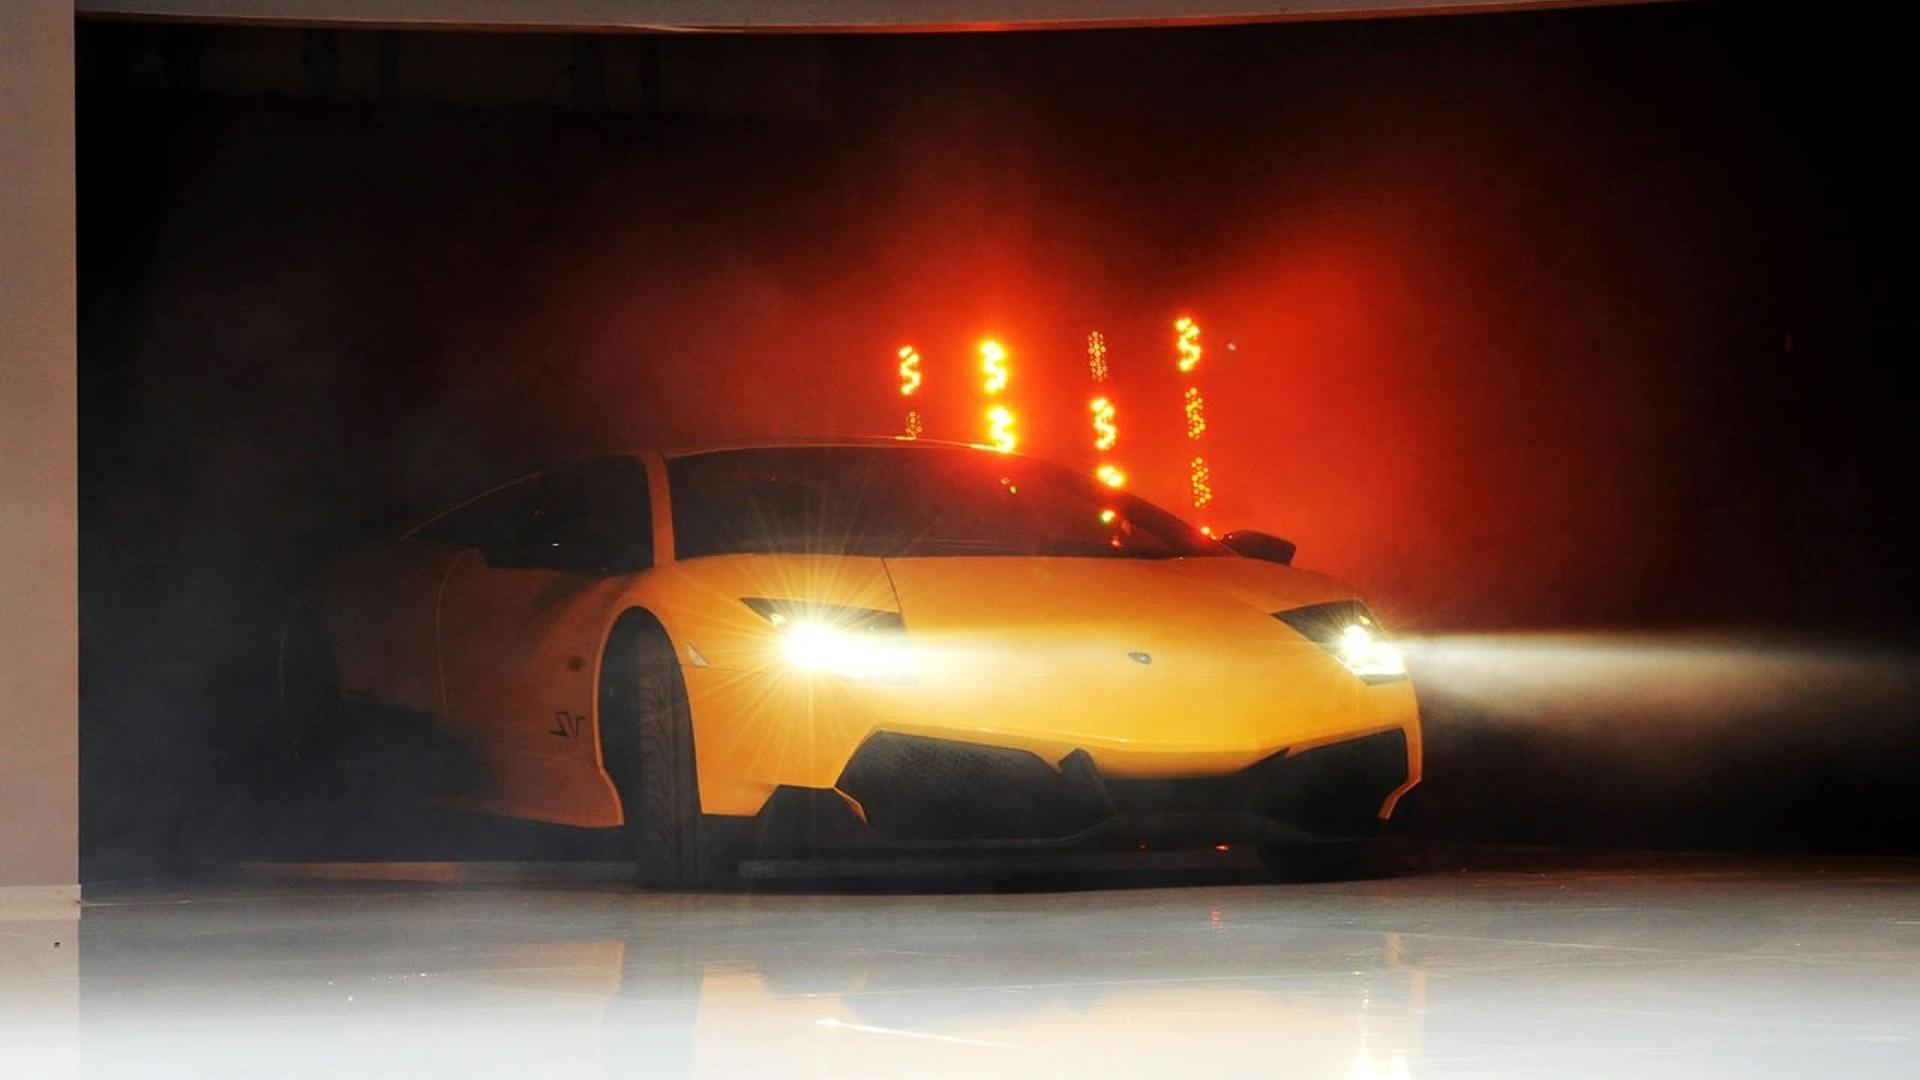 Lamborghini Murcielago Lp 670 4 Superveloce Official Details Revealed